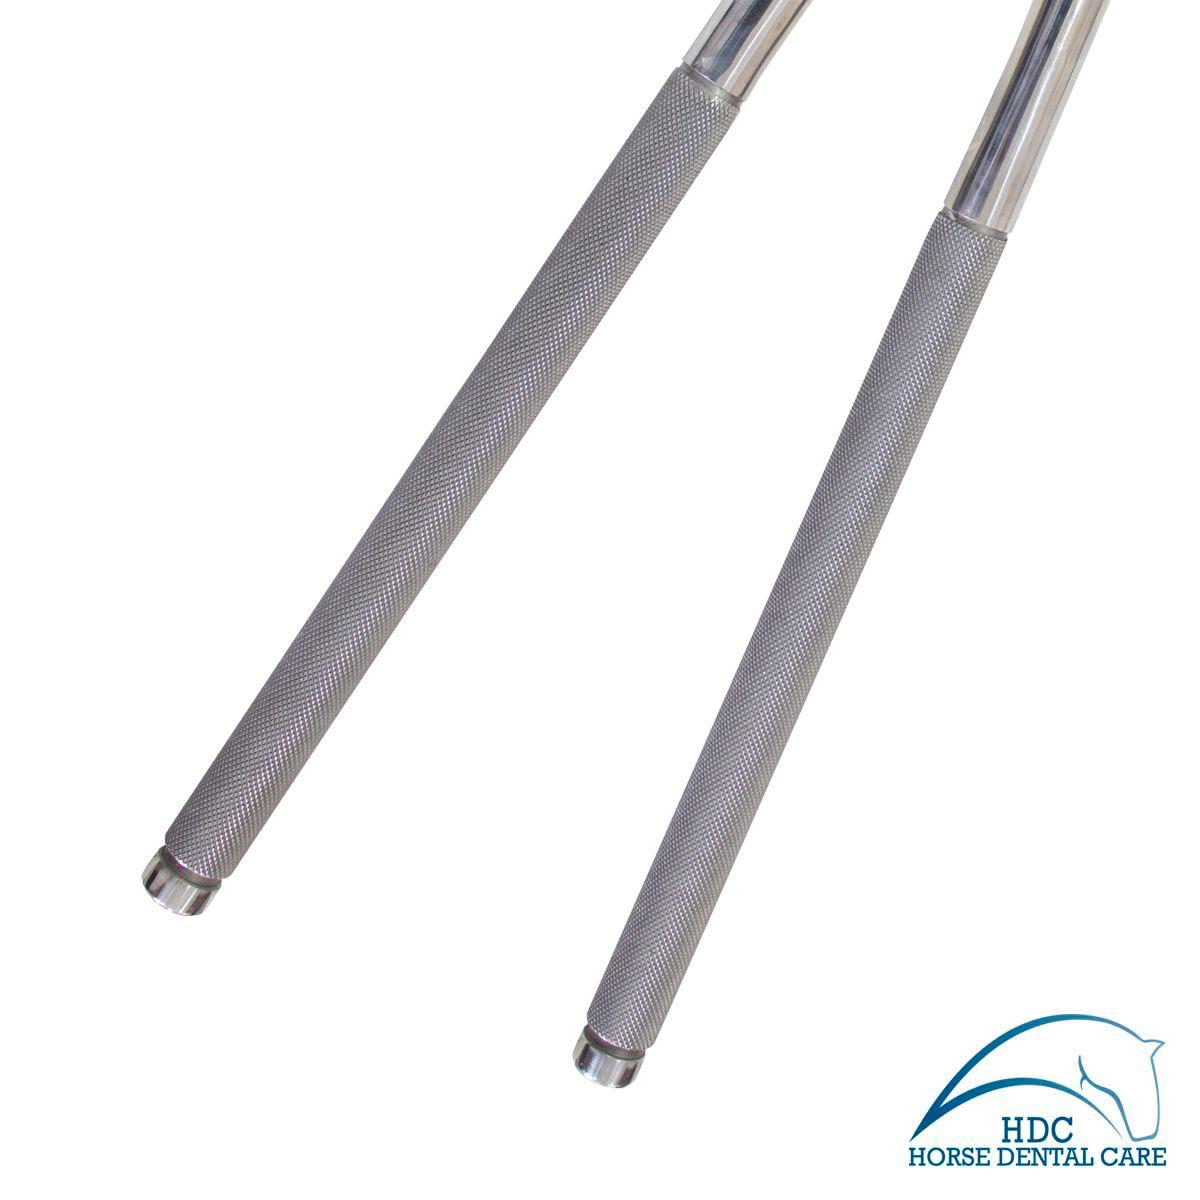 Afastador (Spreader) de Molares e Pré-Molares Caudal (Distal) 9mm